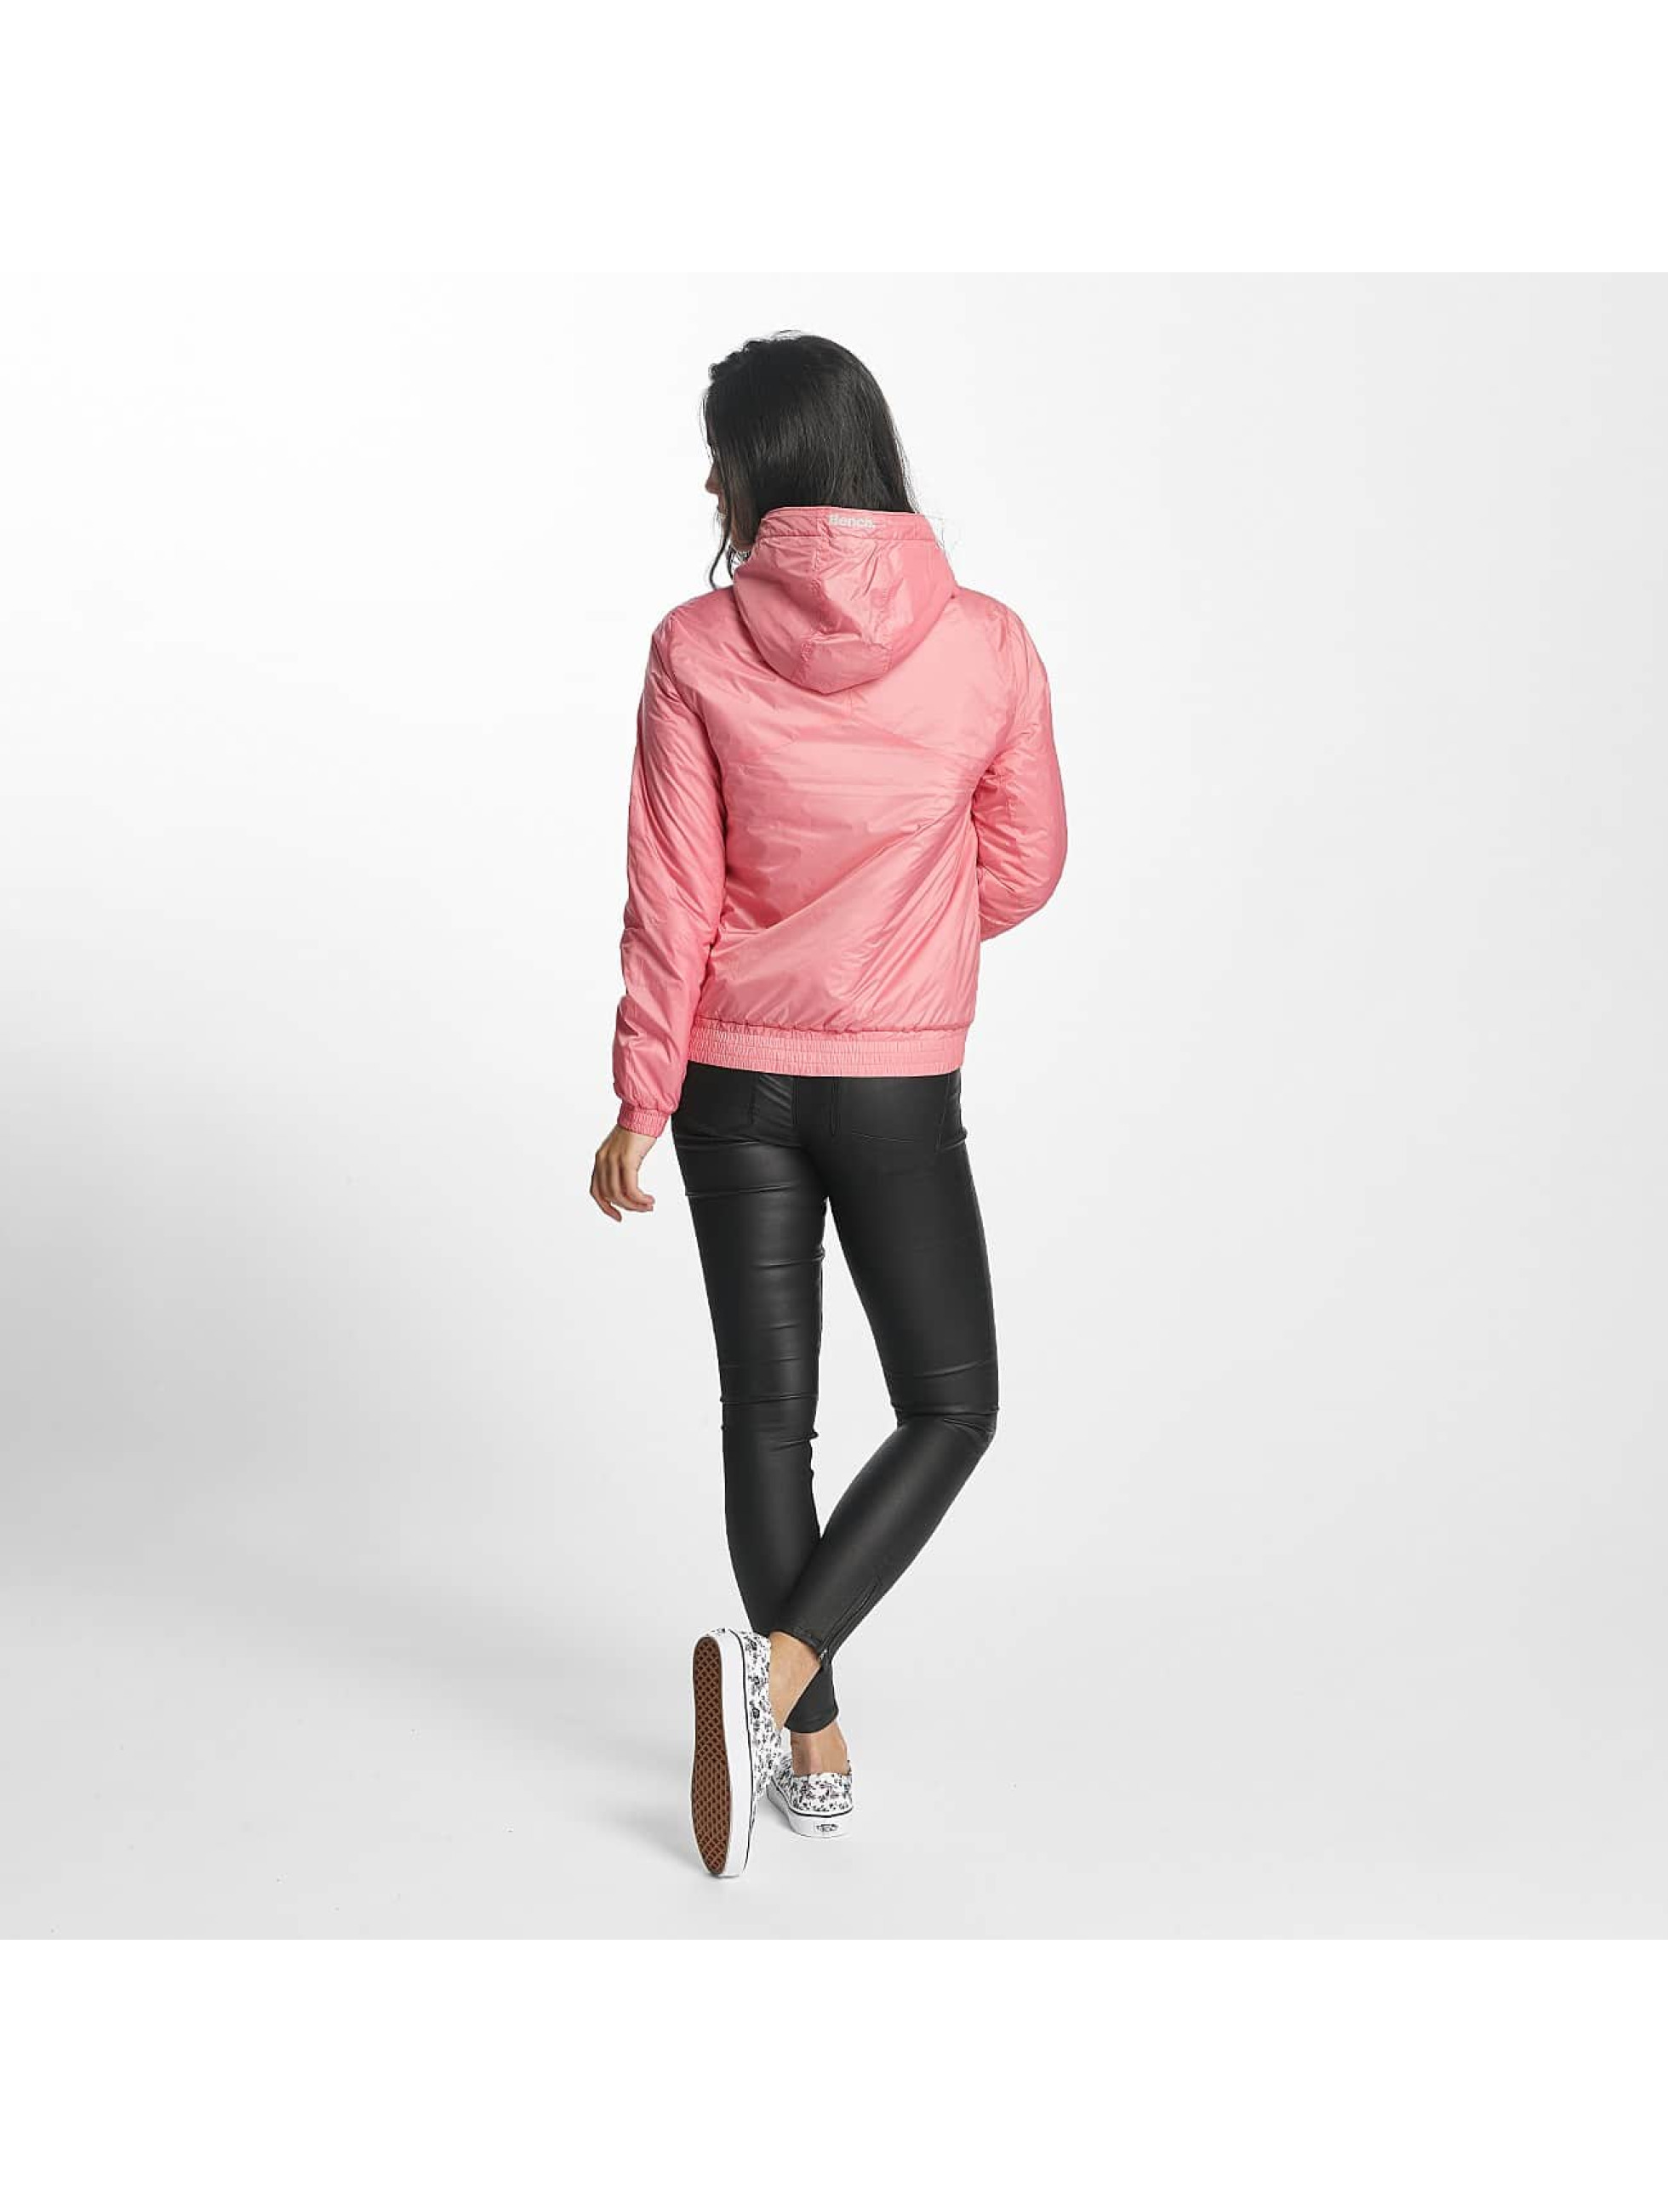 Bench Giacca Mezza Stagione Light Padded rosa chiaro